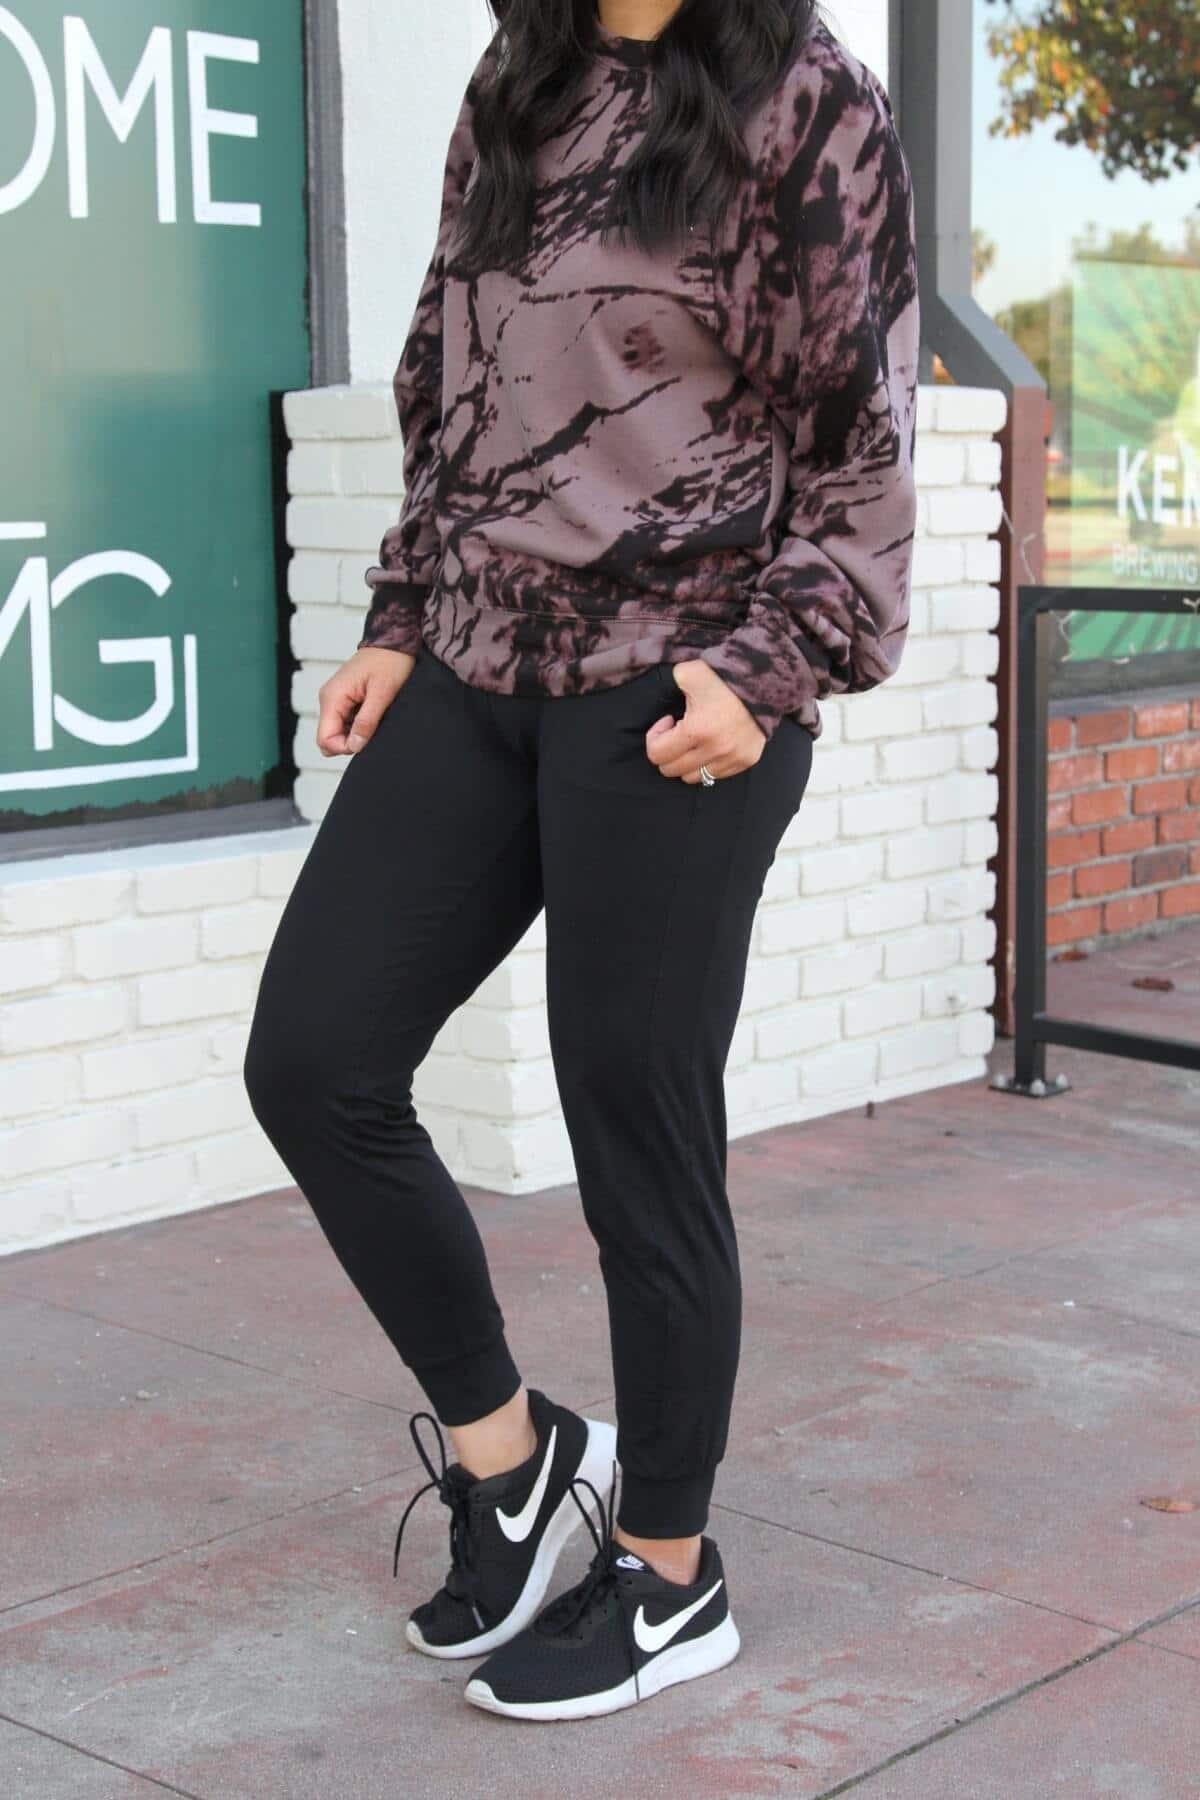 Athleisure Outfit: black joggers + purple and black splattered sweatshirt + black sneakers